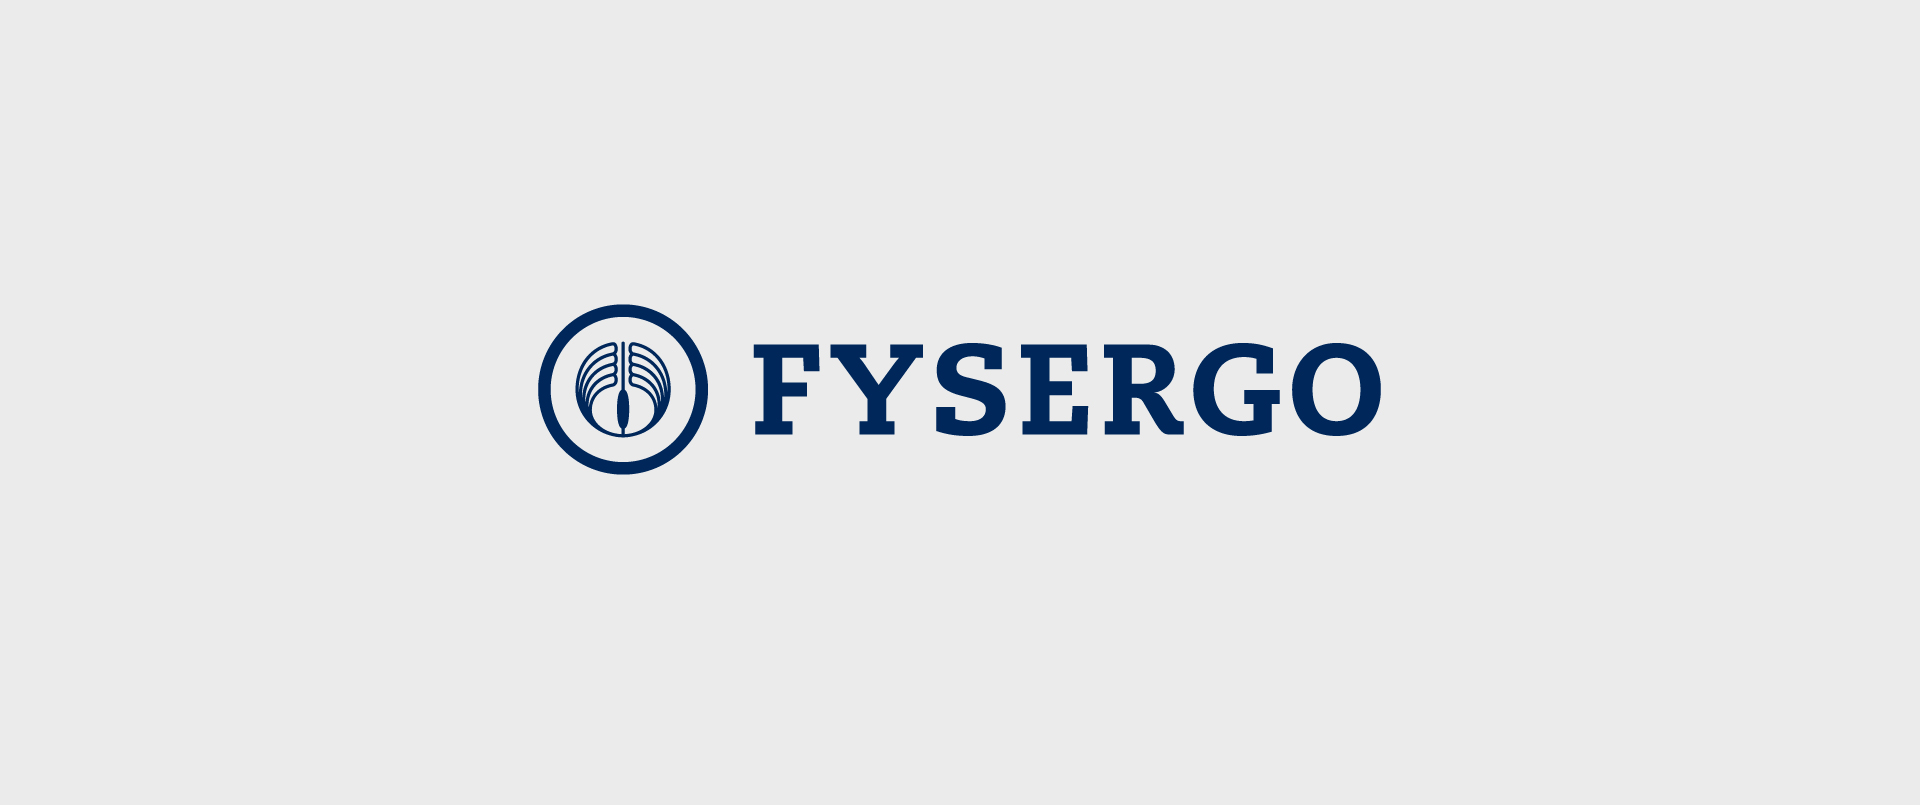 Fysergo-1